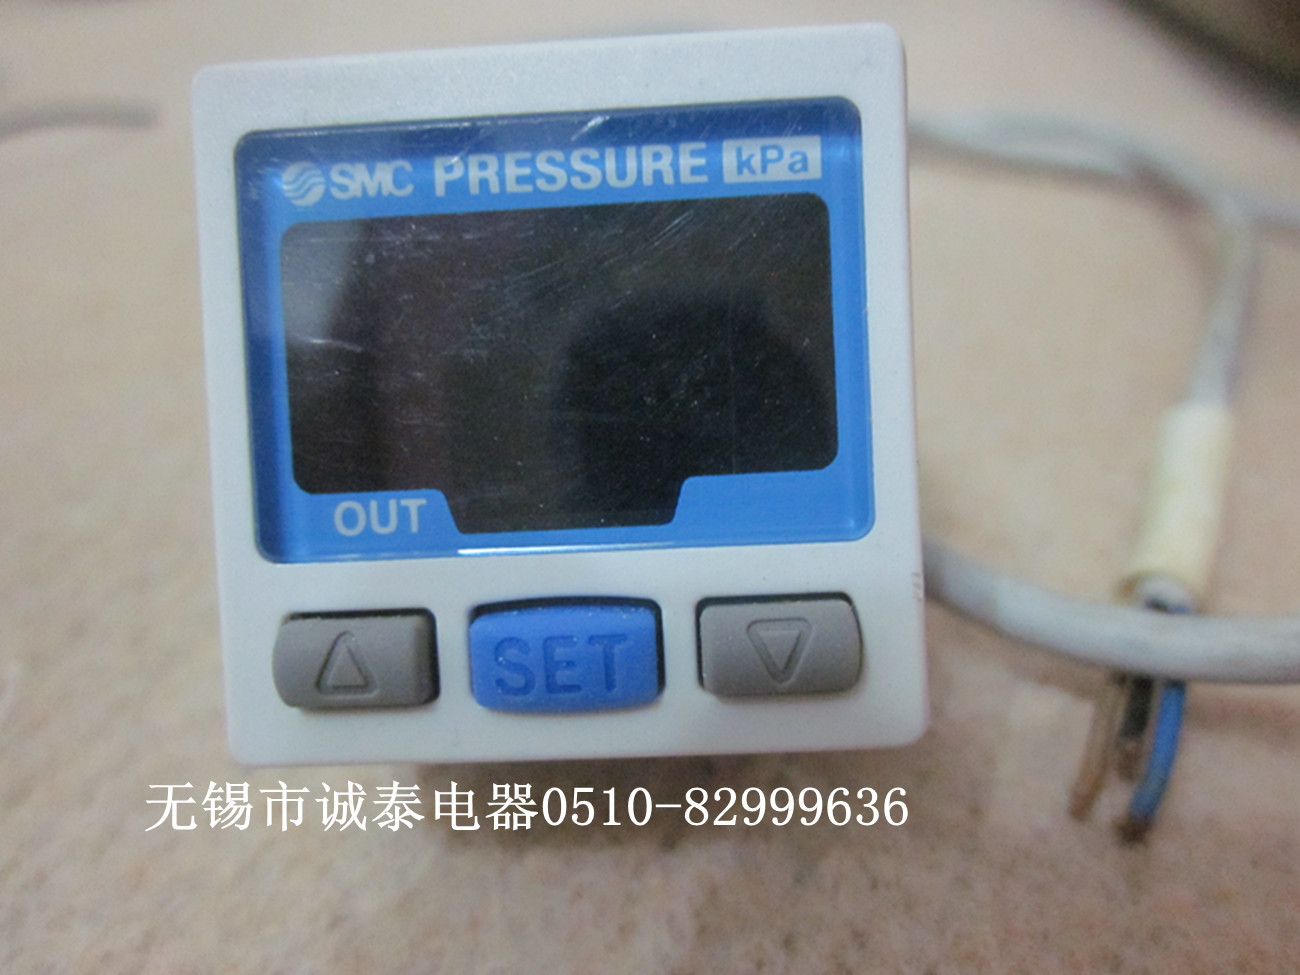 [SMC] no genuine digital pressure gauge ZSE30-01-25